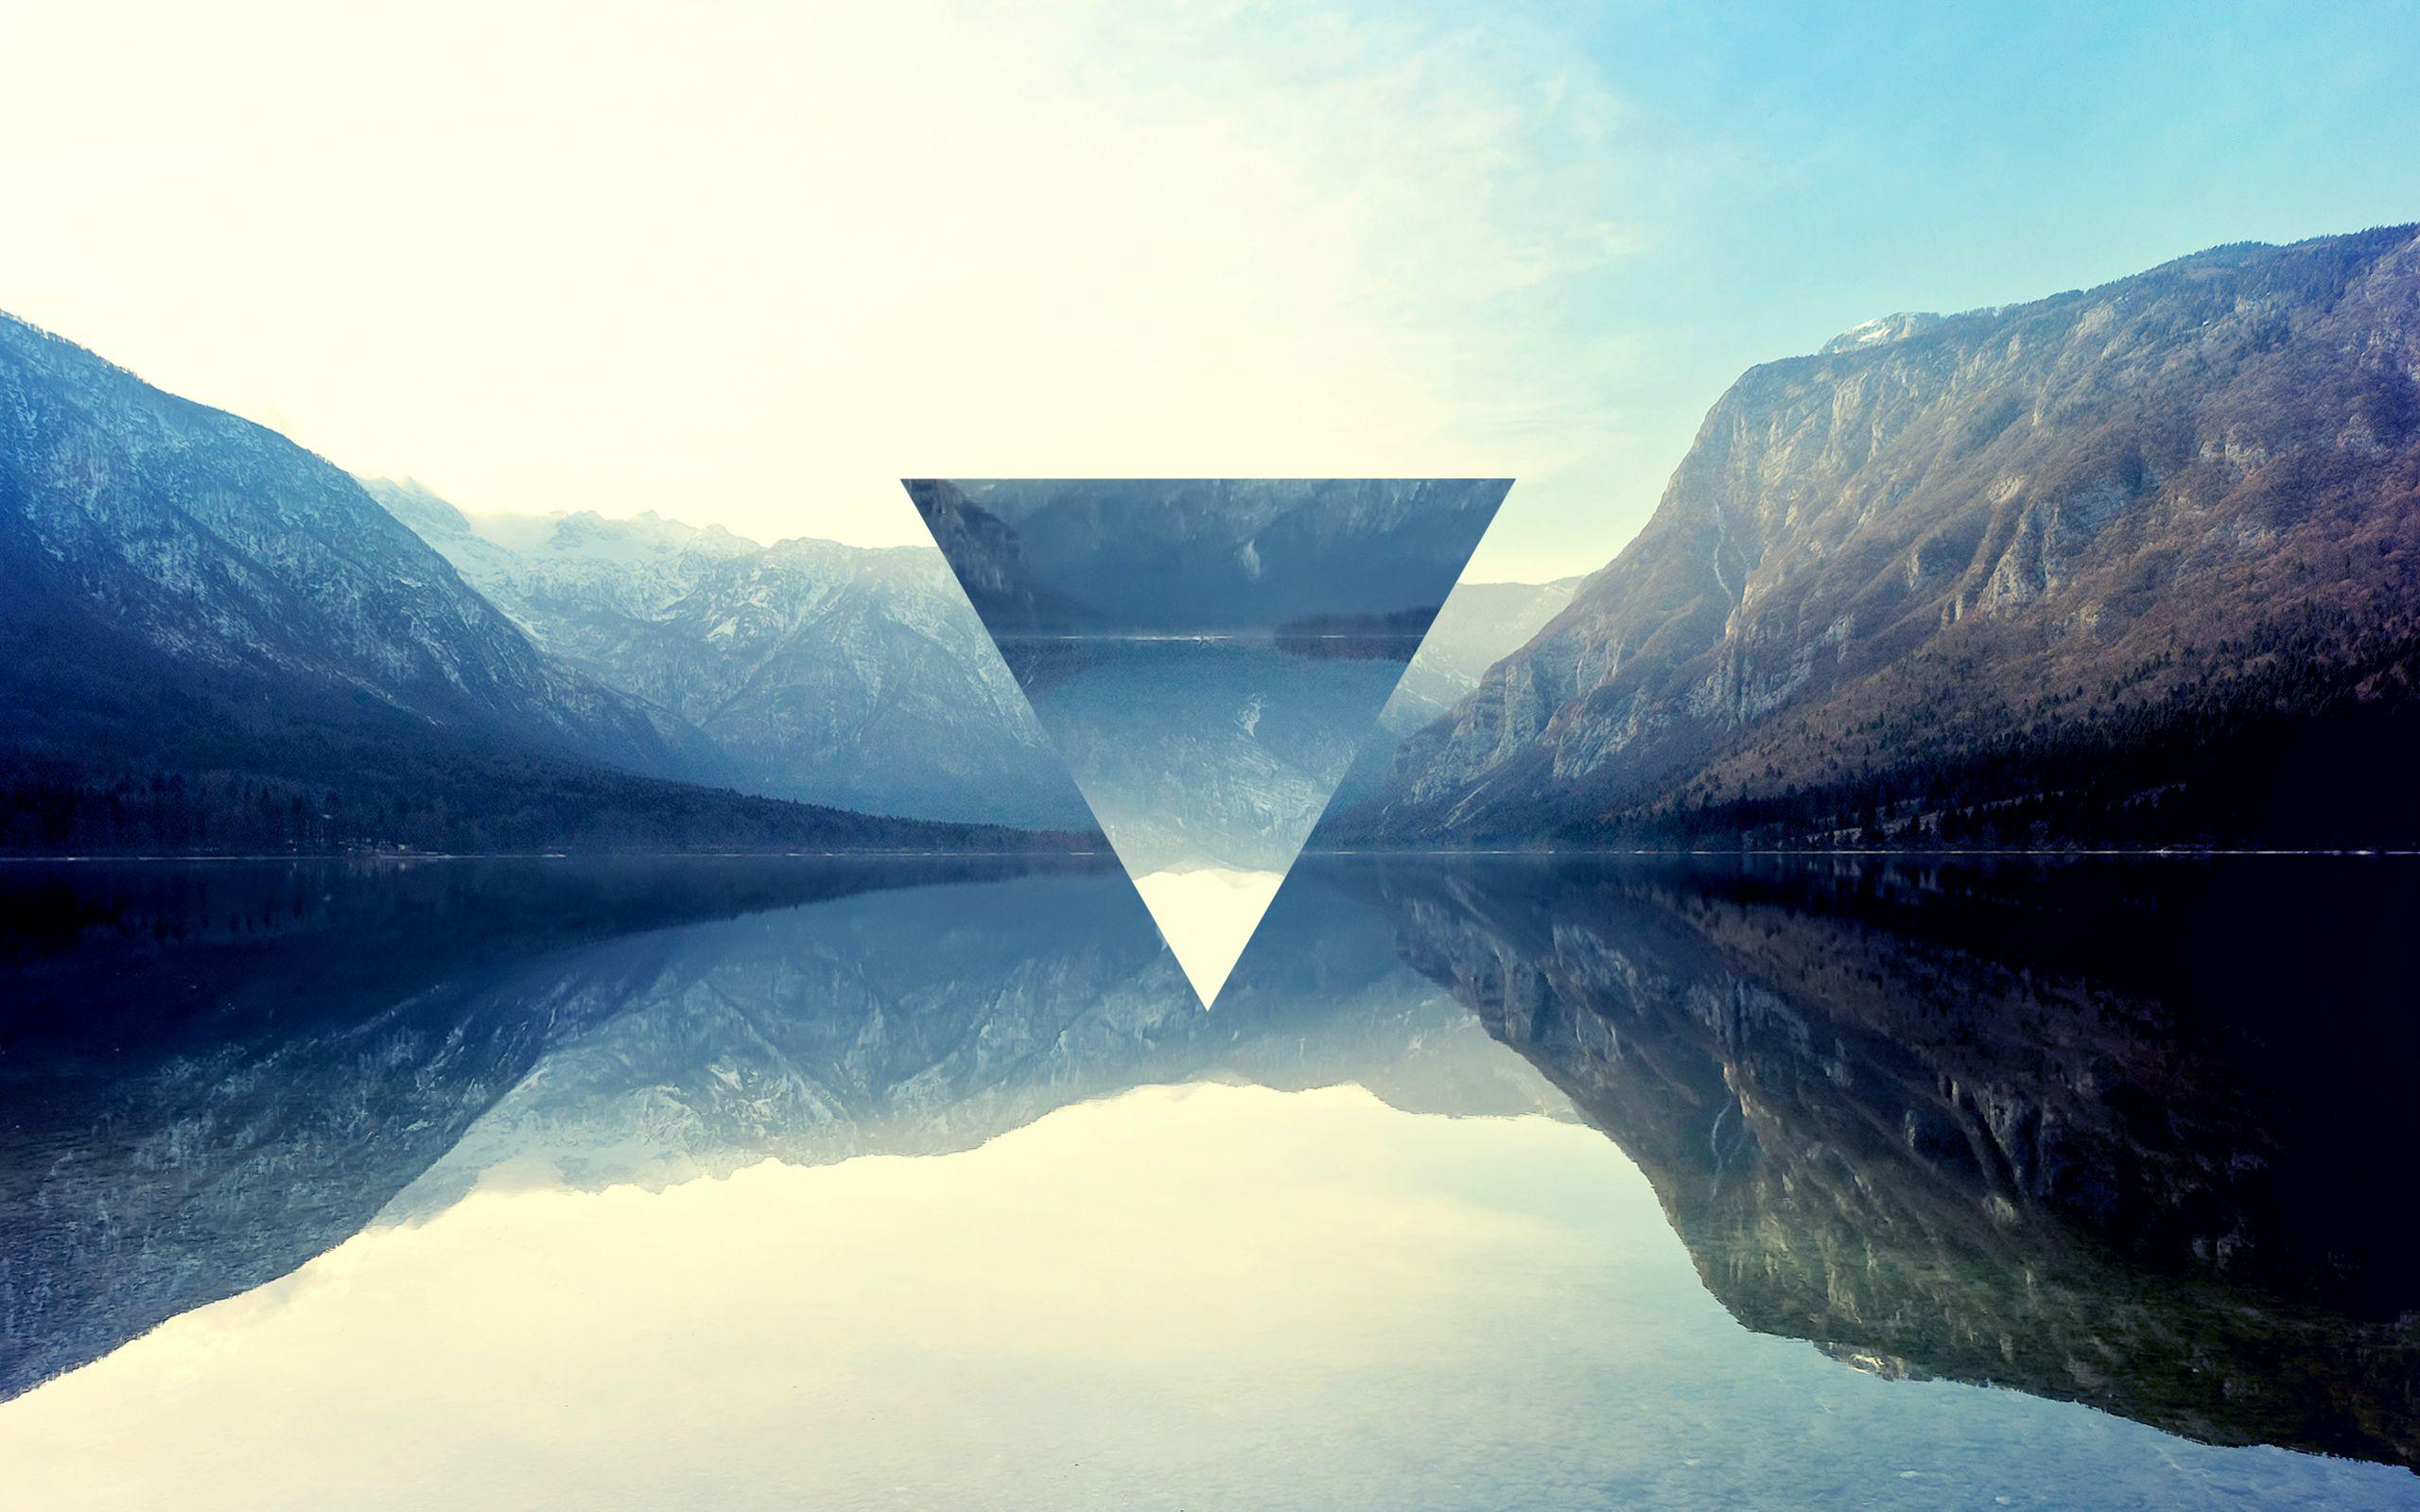 Polyscape HD wallpapers, Desktop wallpaper - most viewed